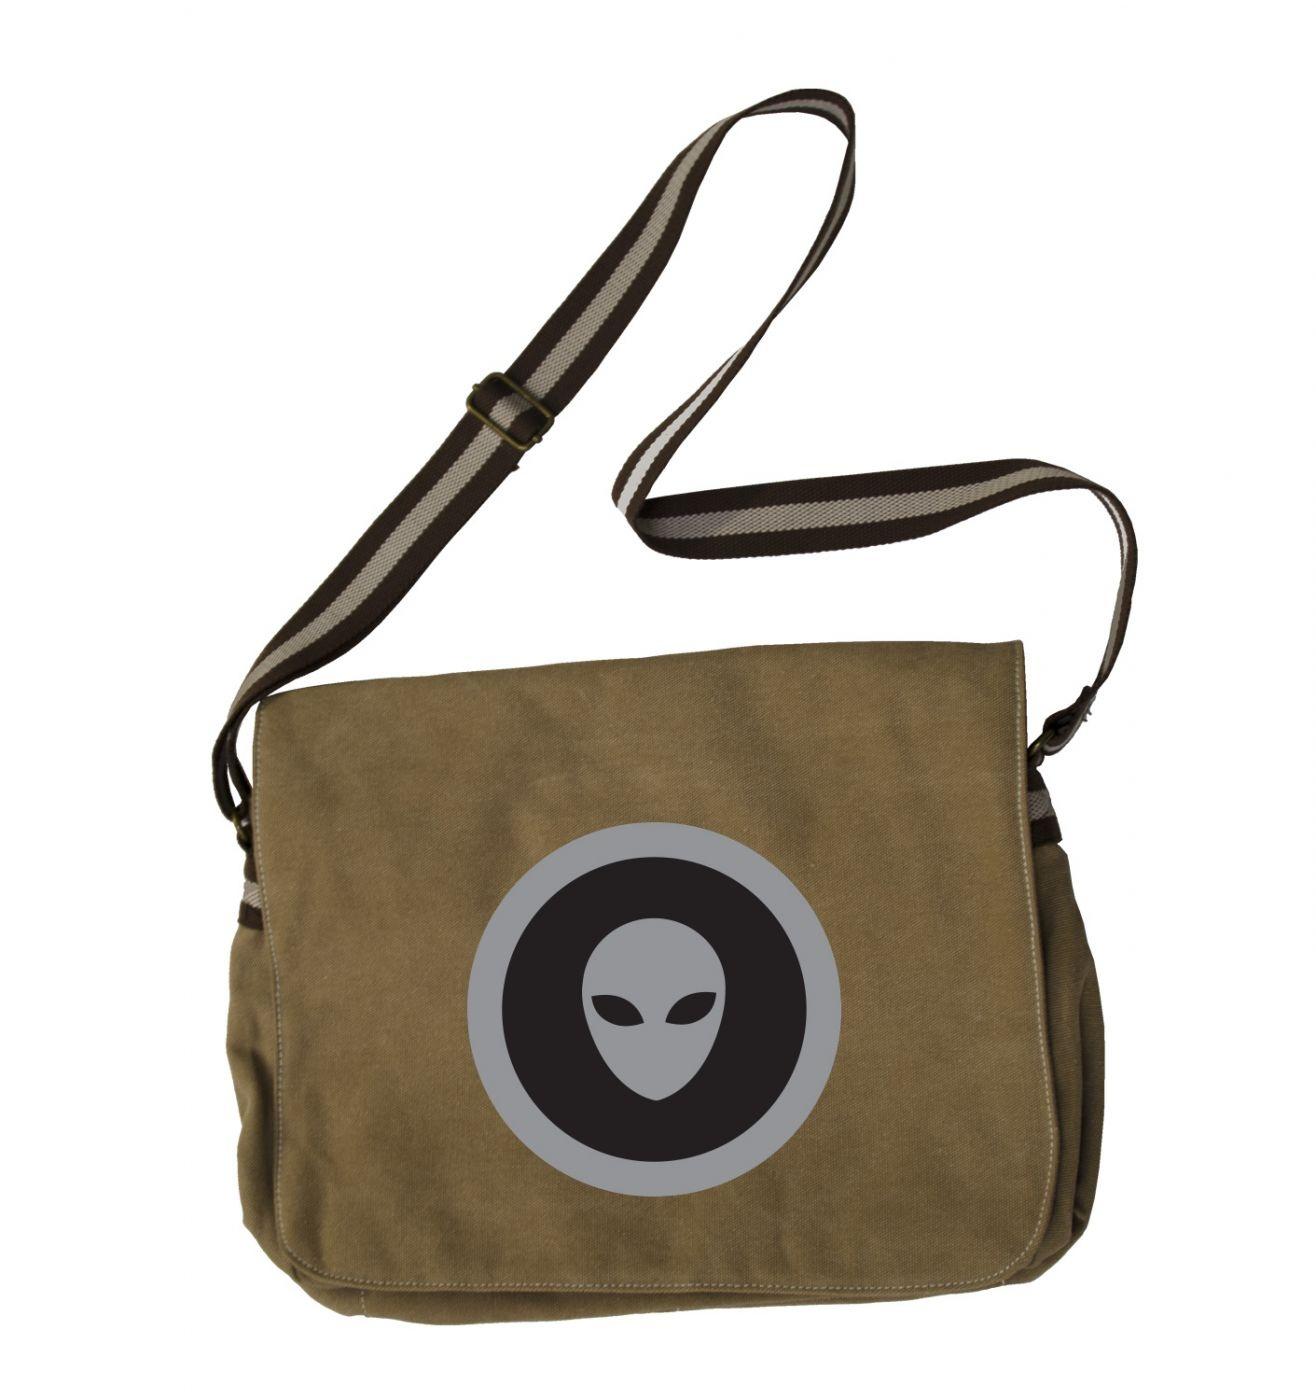 Grey Alien Head Black Fill messenger bag - sci fi school bag